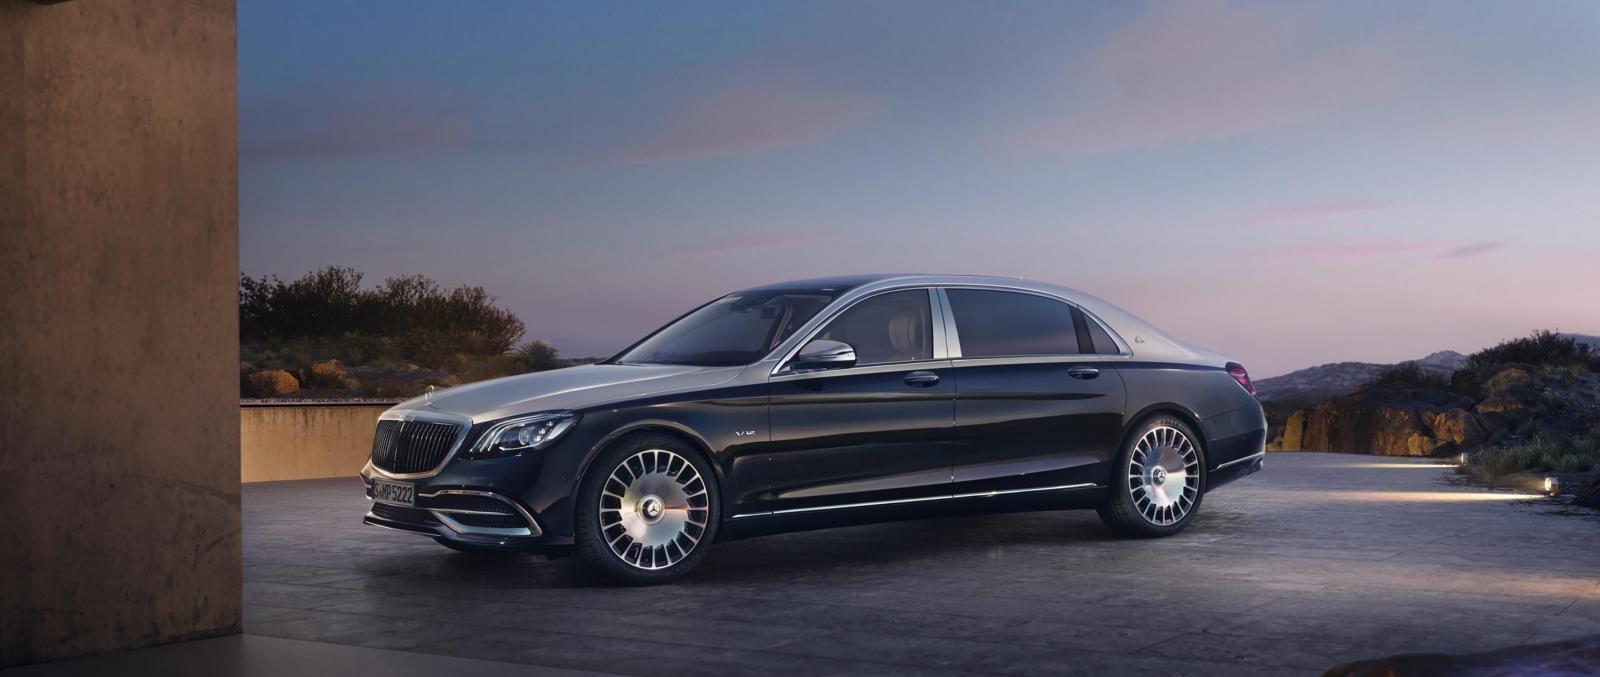 Giá xe Mercedes Maybach